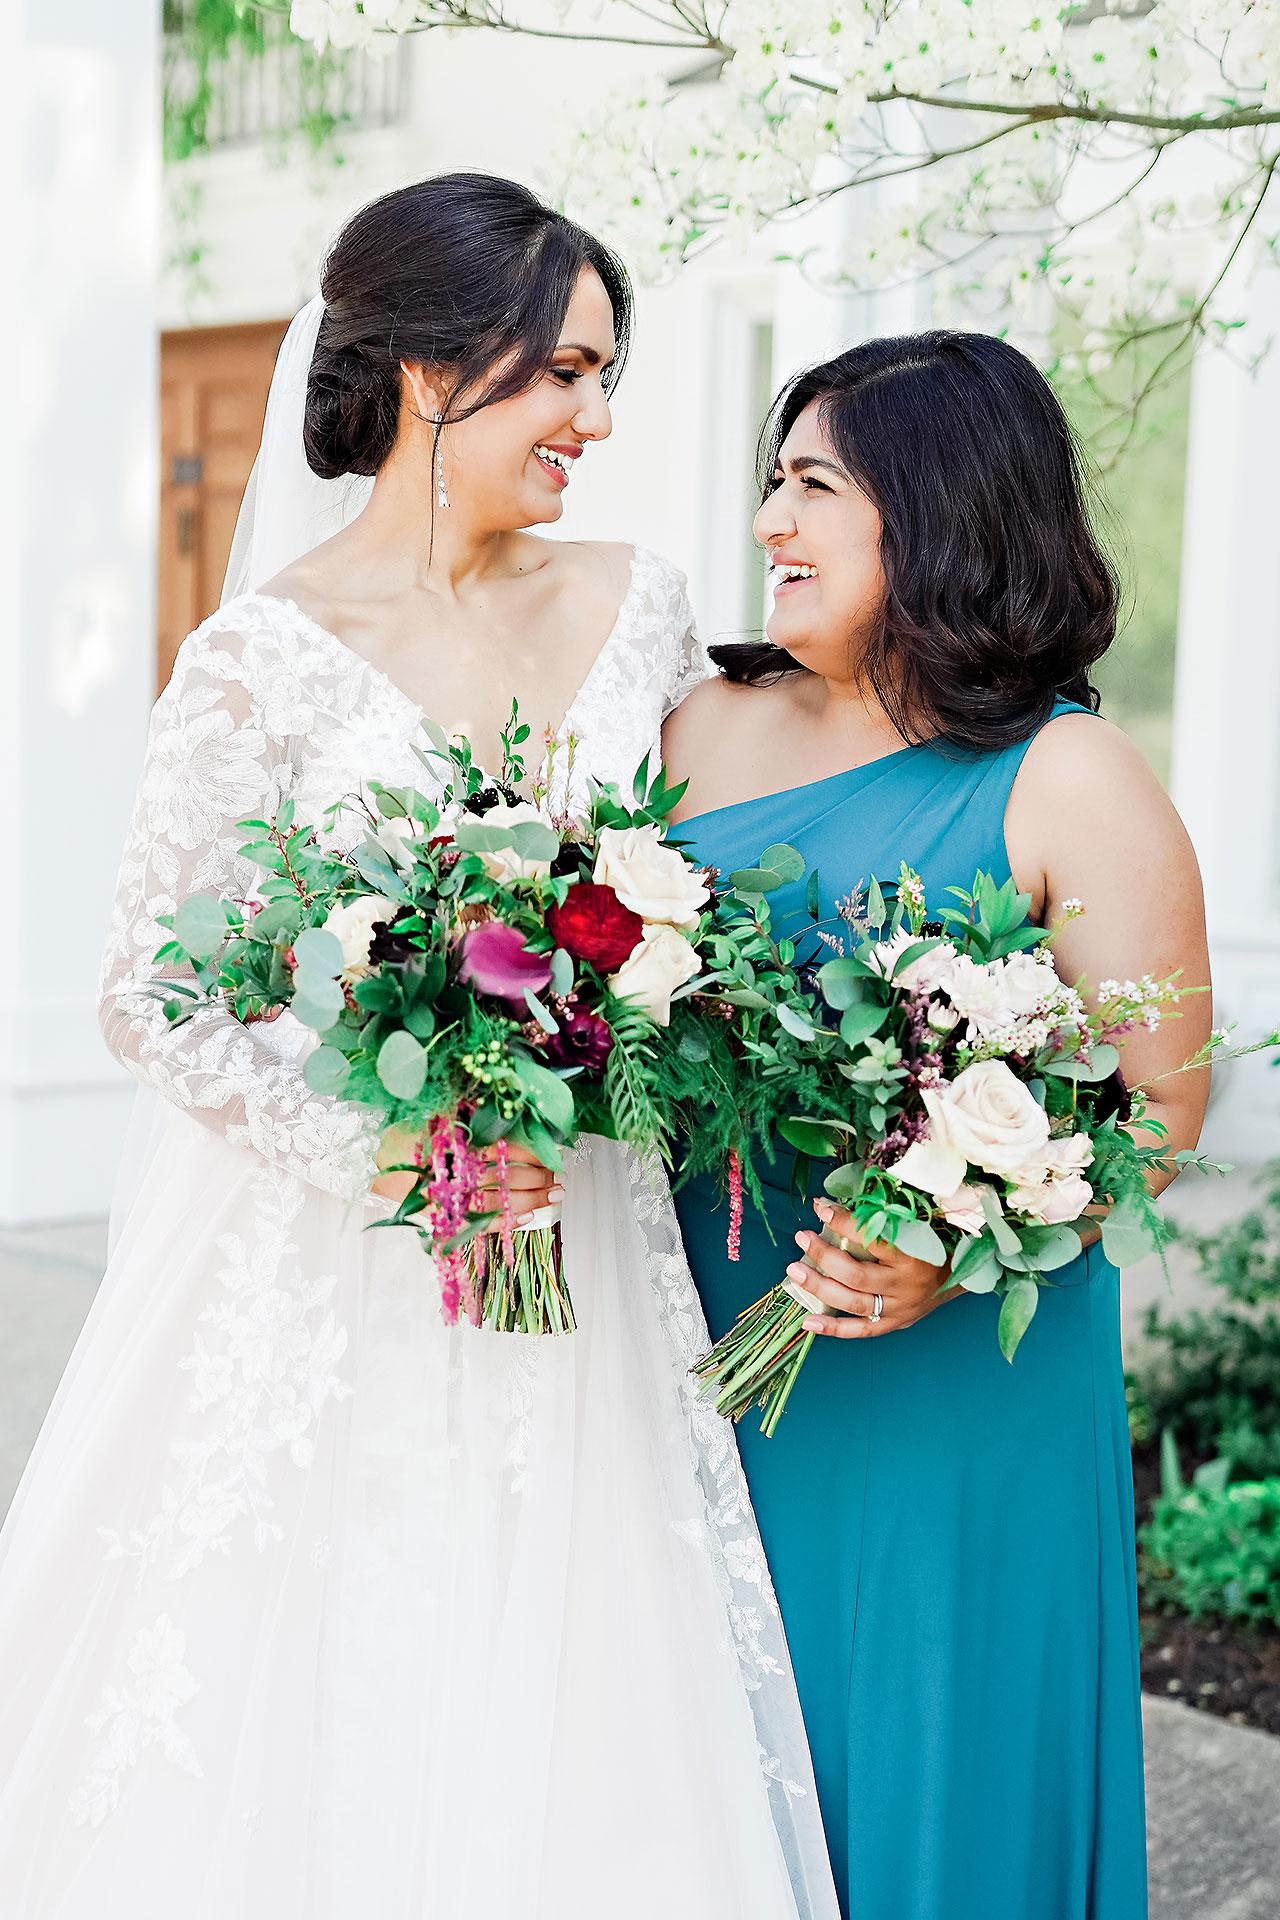 Nadia Parker Black Iris Estate Carmel Indiana Wedding May 2021 154